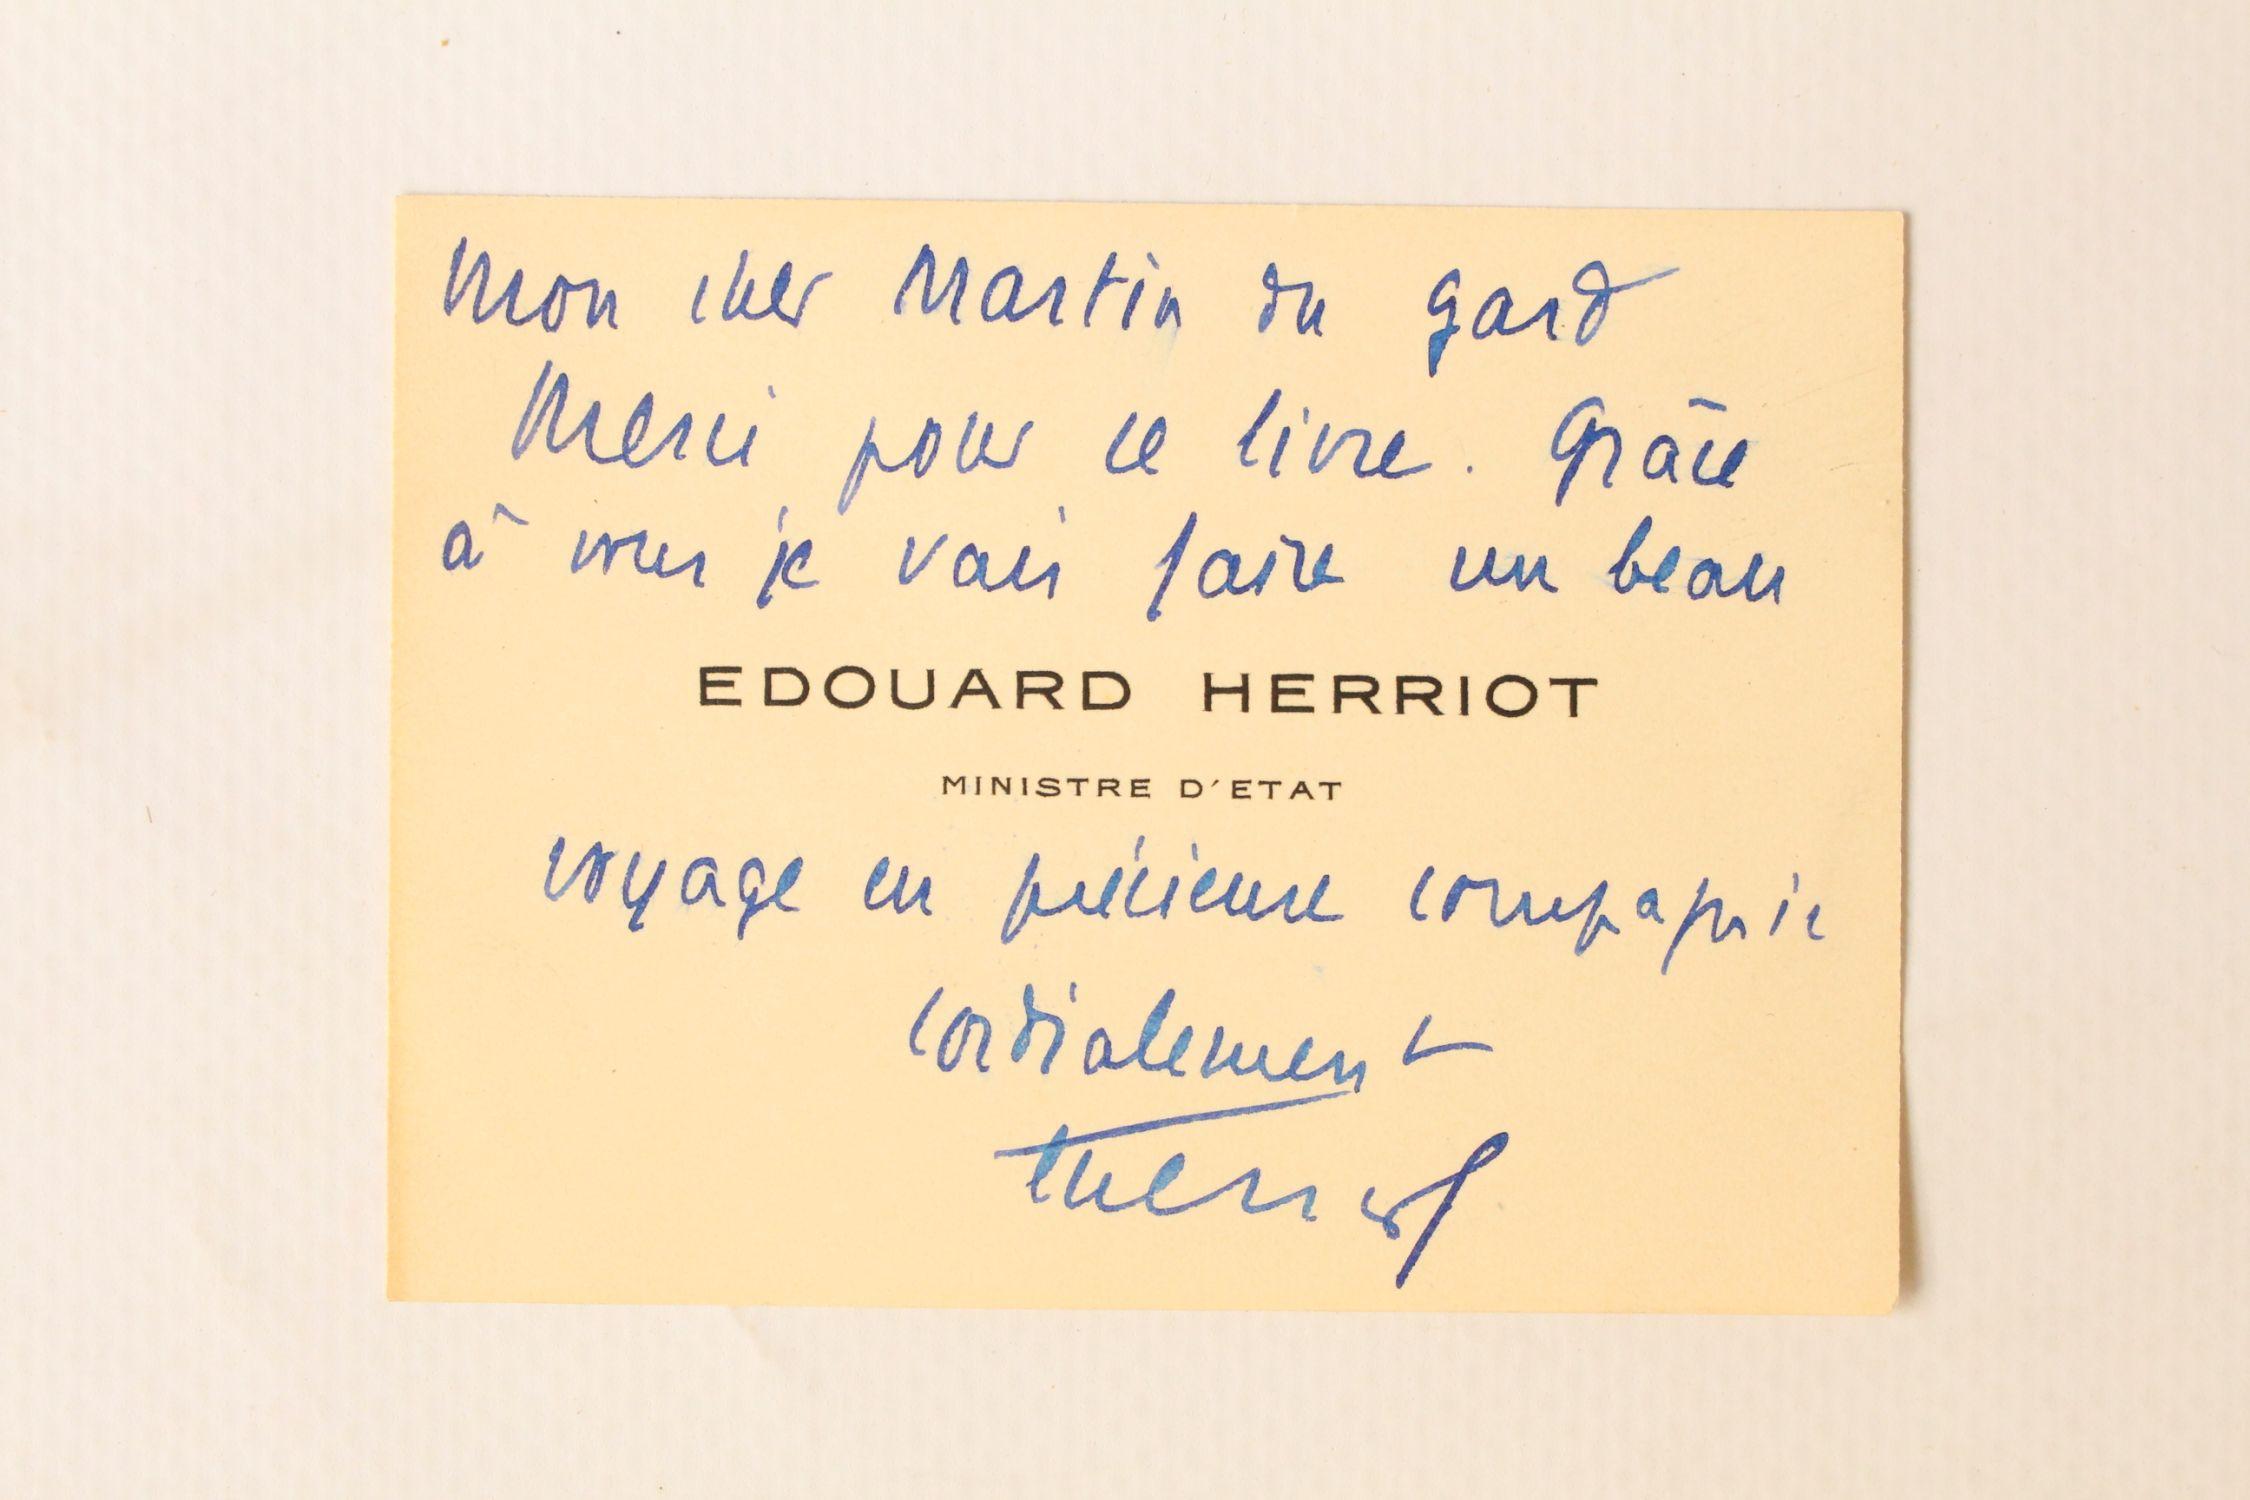 HERRIOT Carte De Visite Imprime Enrichie Dune Ddicace Maurice Martin Du Gard